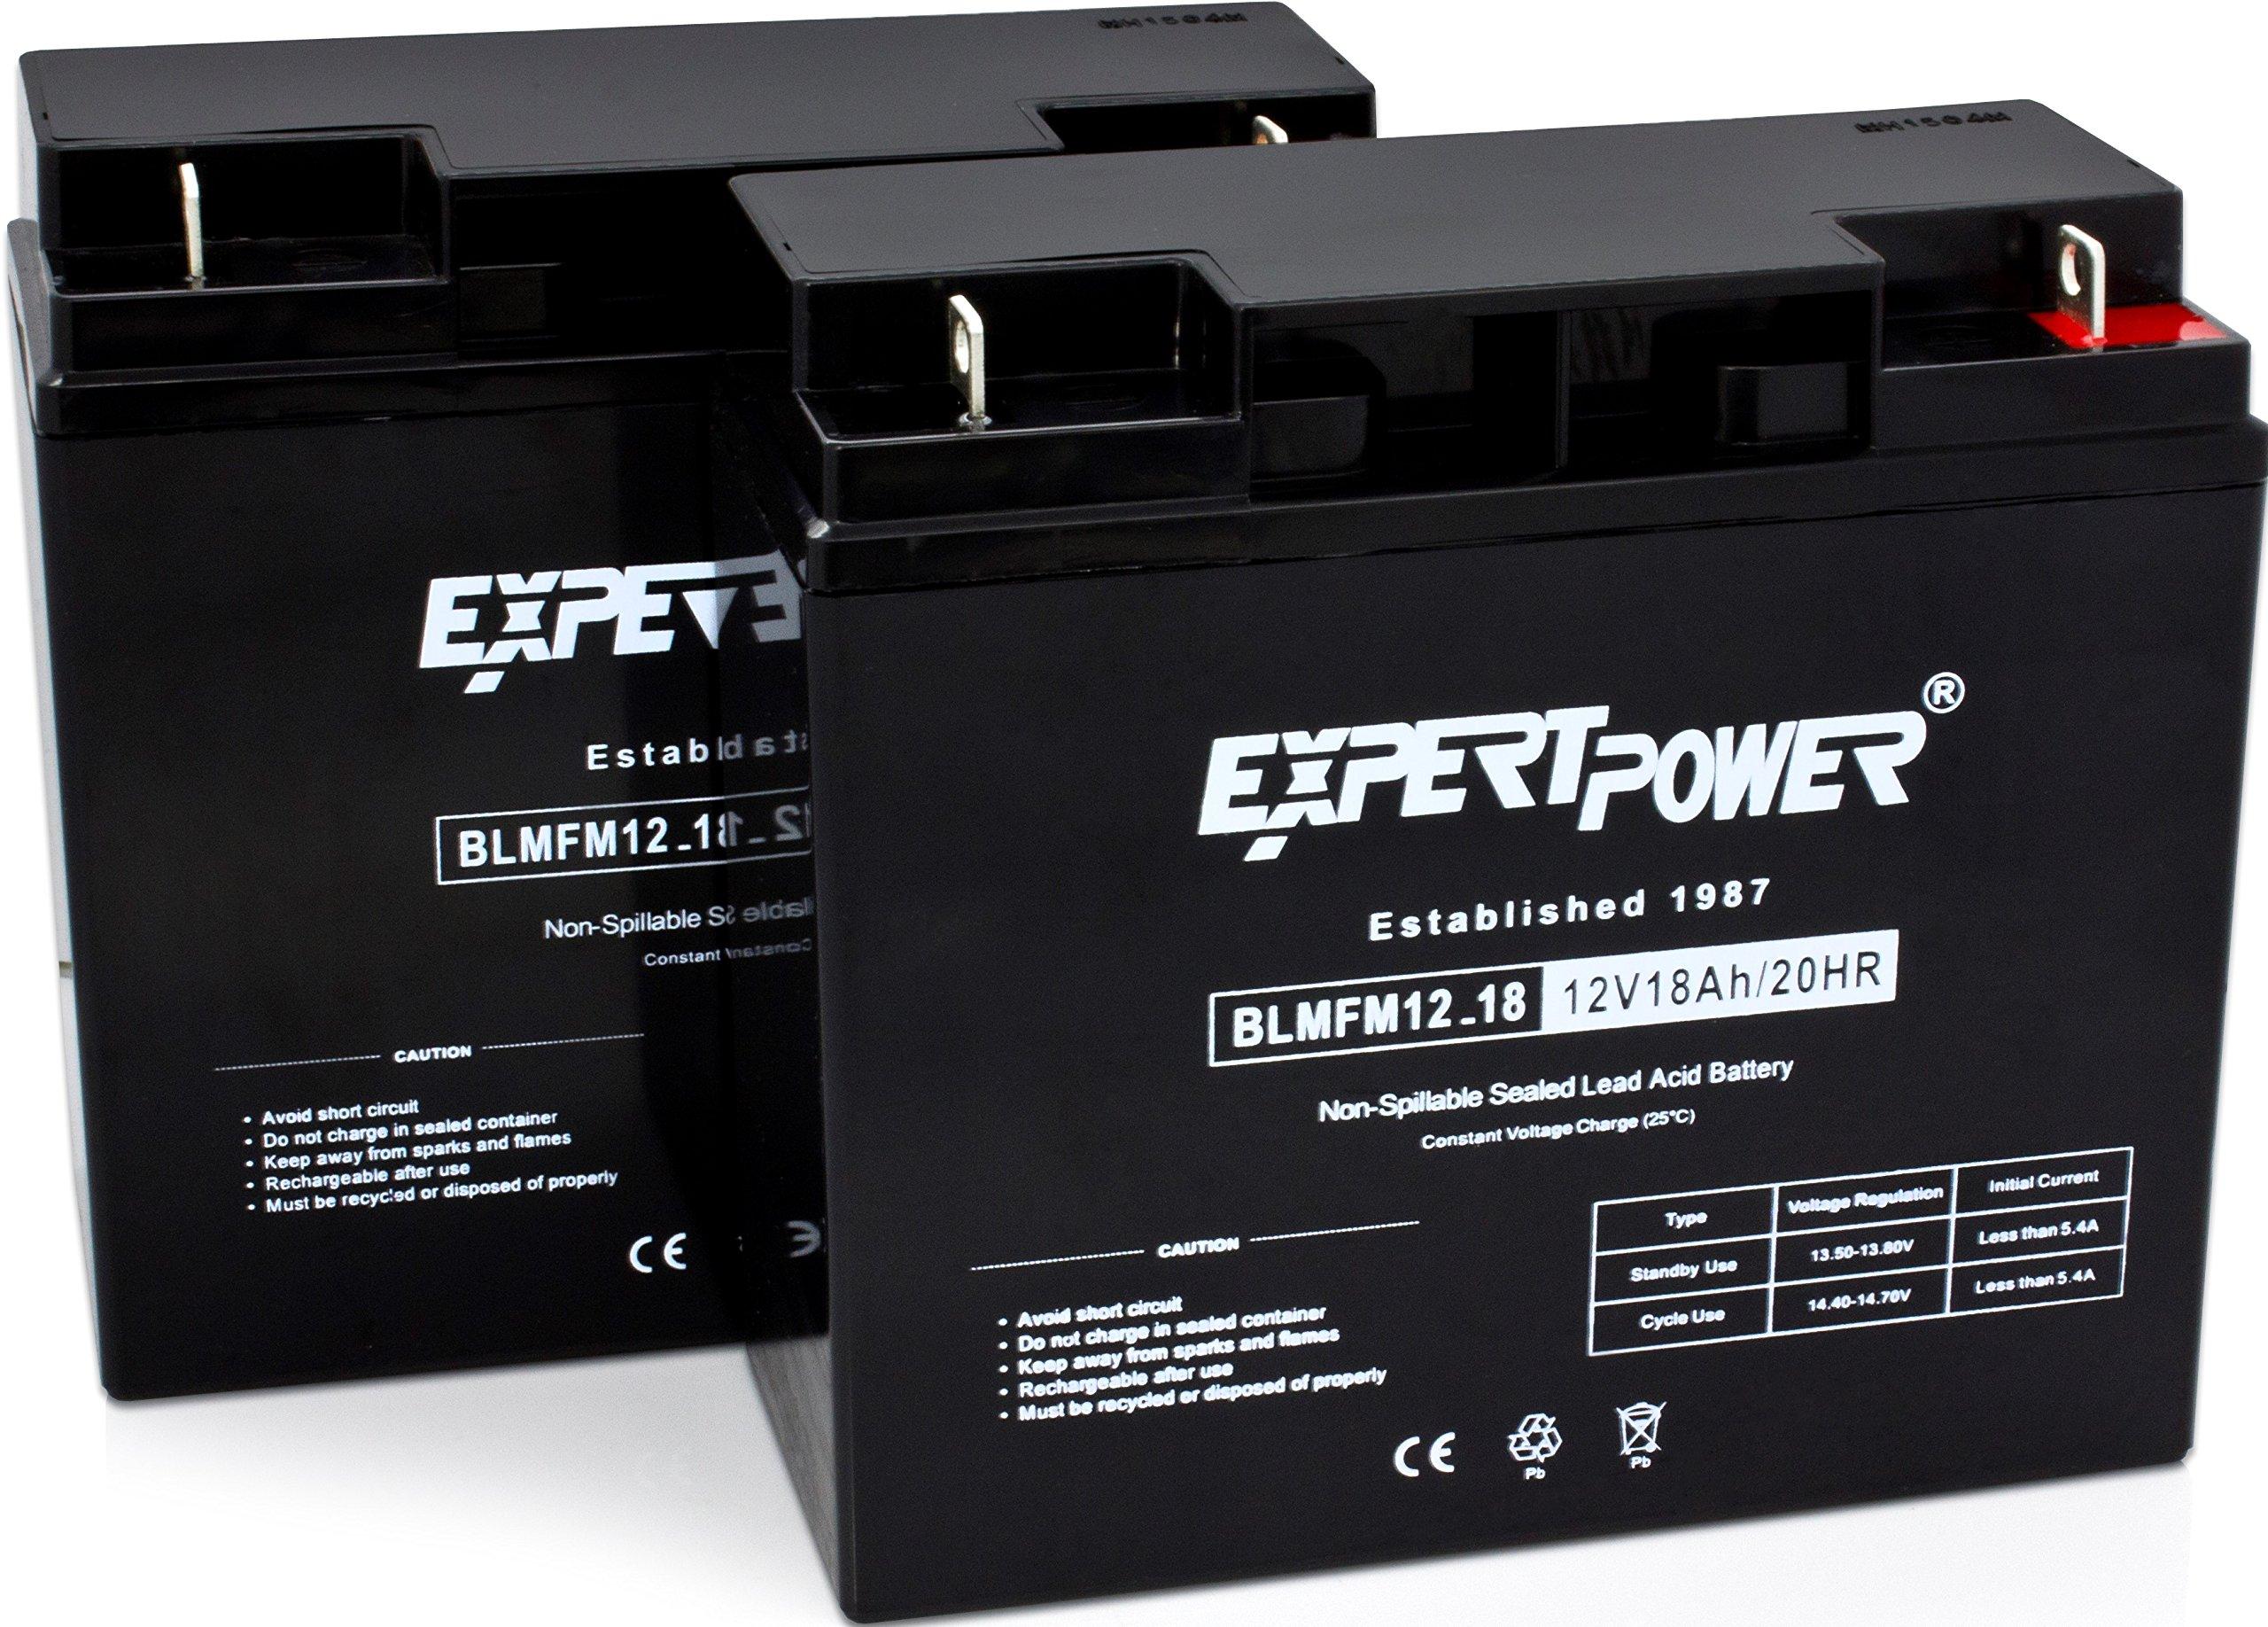 ExpertPower EXP12180-2 Standard  RBC7 Replacement Rechargeable SLA Battery (Reuse Existing Connectors, 12 Volt 18 Ah), 2 Pack